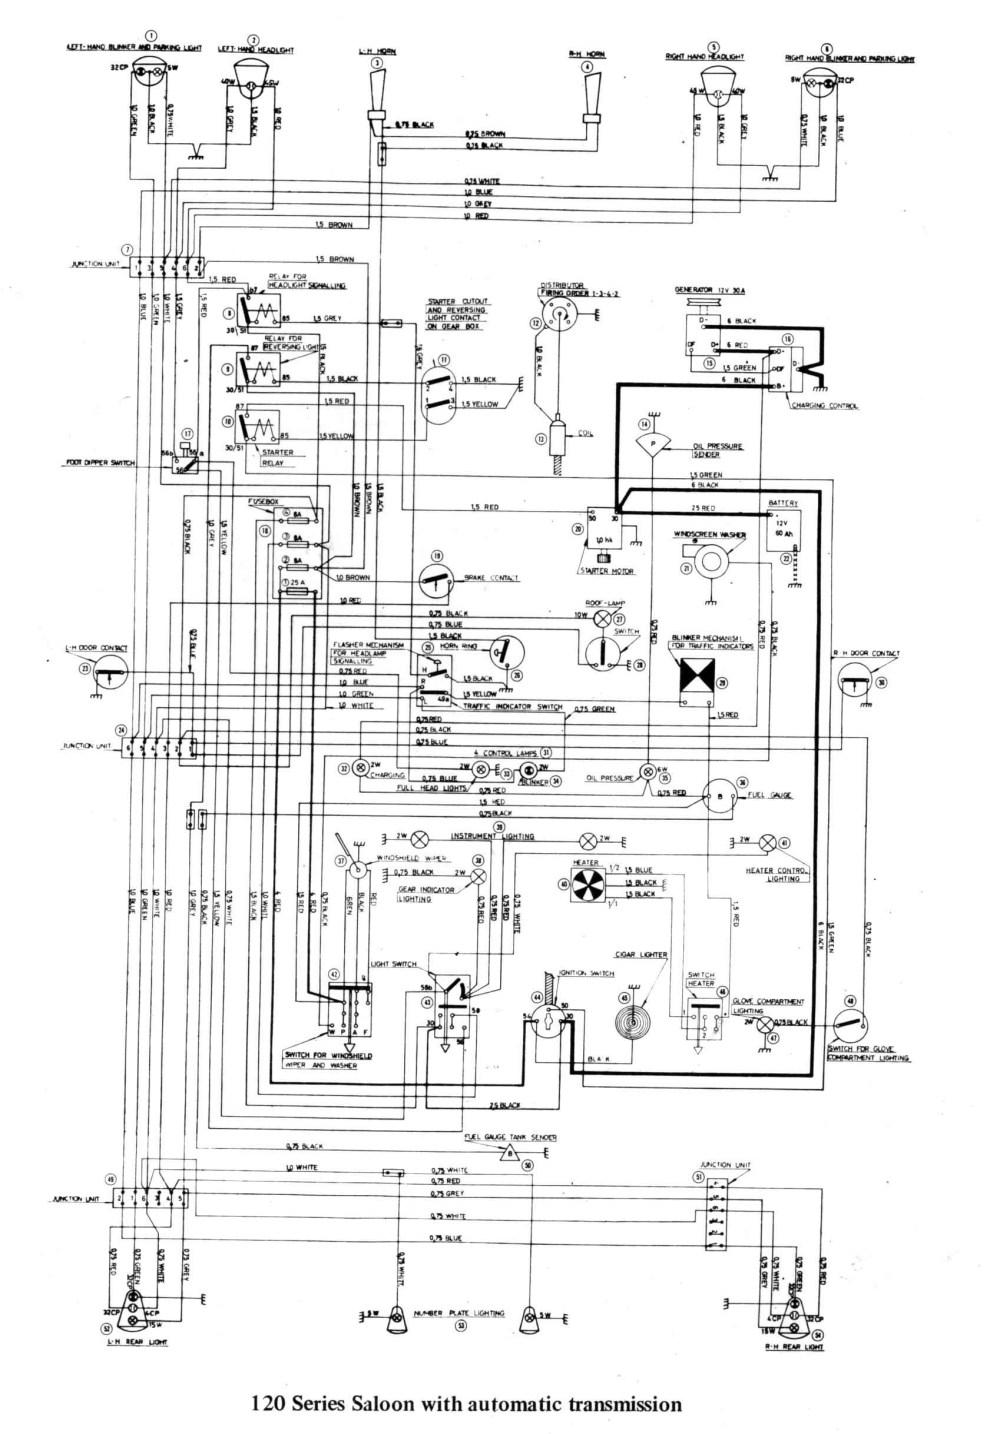 medium resolution of 2000 pontiac montana engine diagram 2000 volvo v70 wiring diagram trans wiring diagrams of 2000